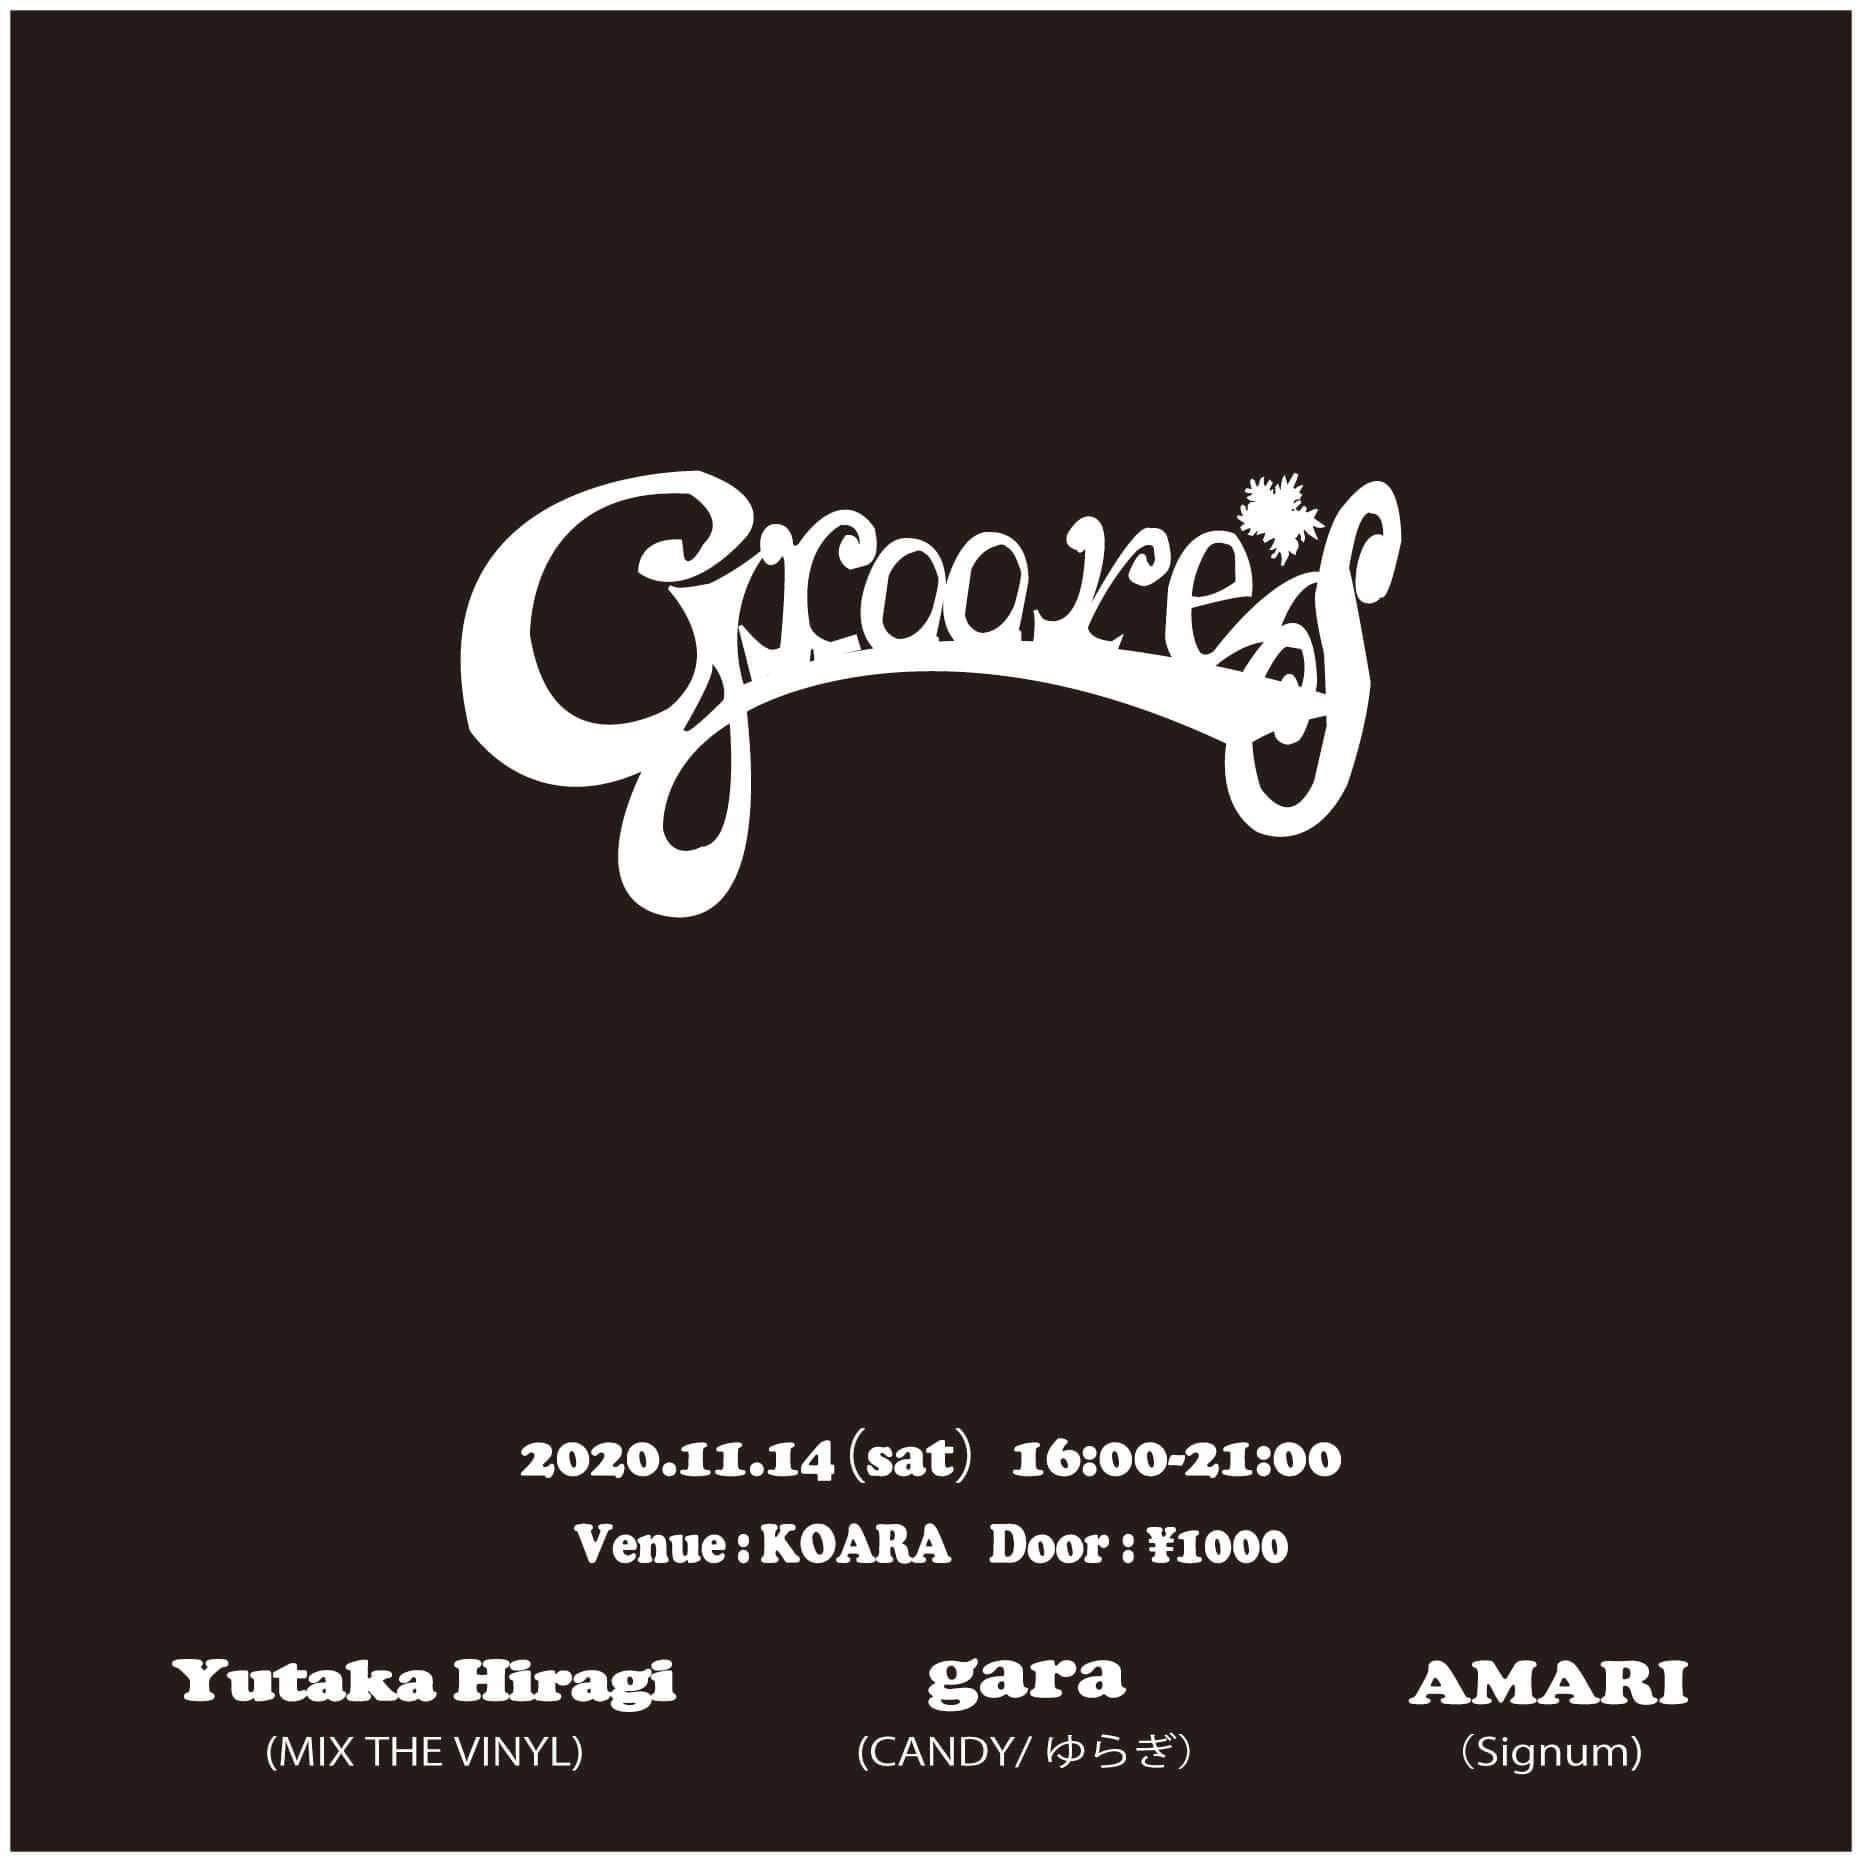 GROOVE's